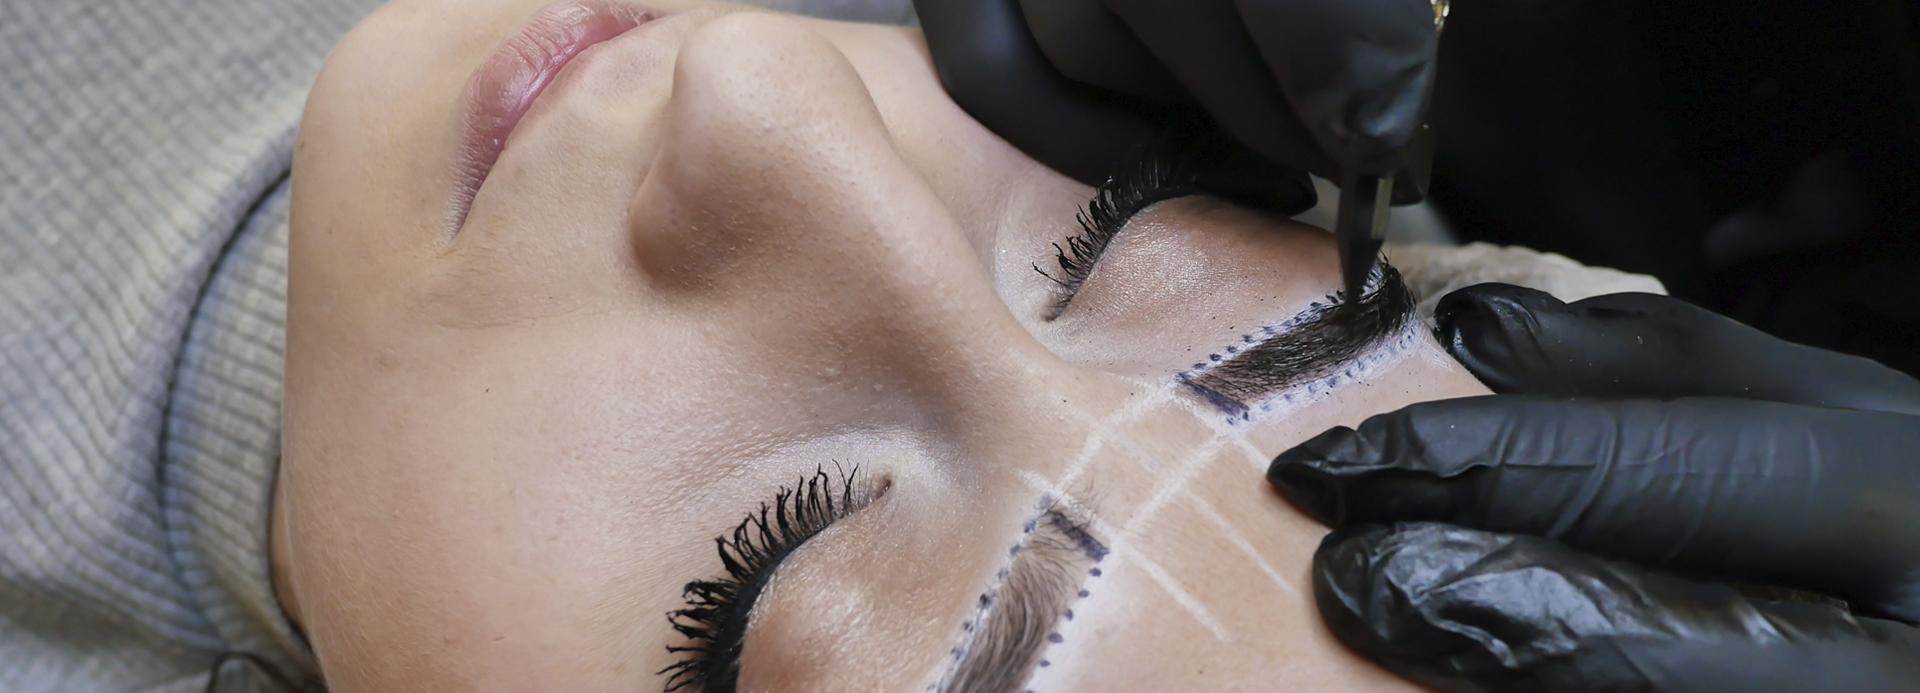 Woman getting elite eyebrows done